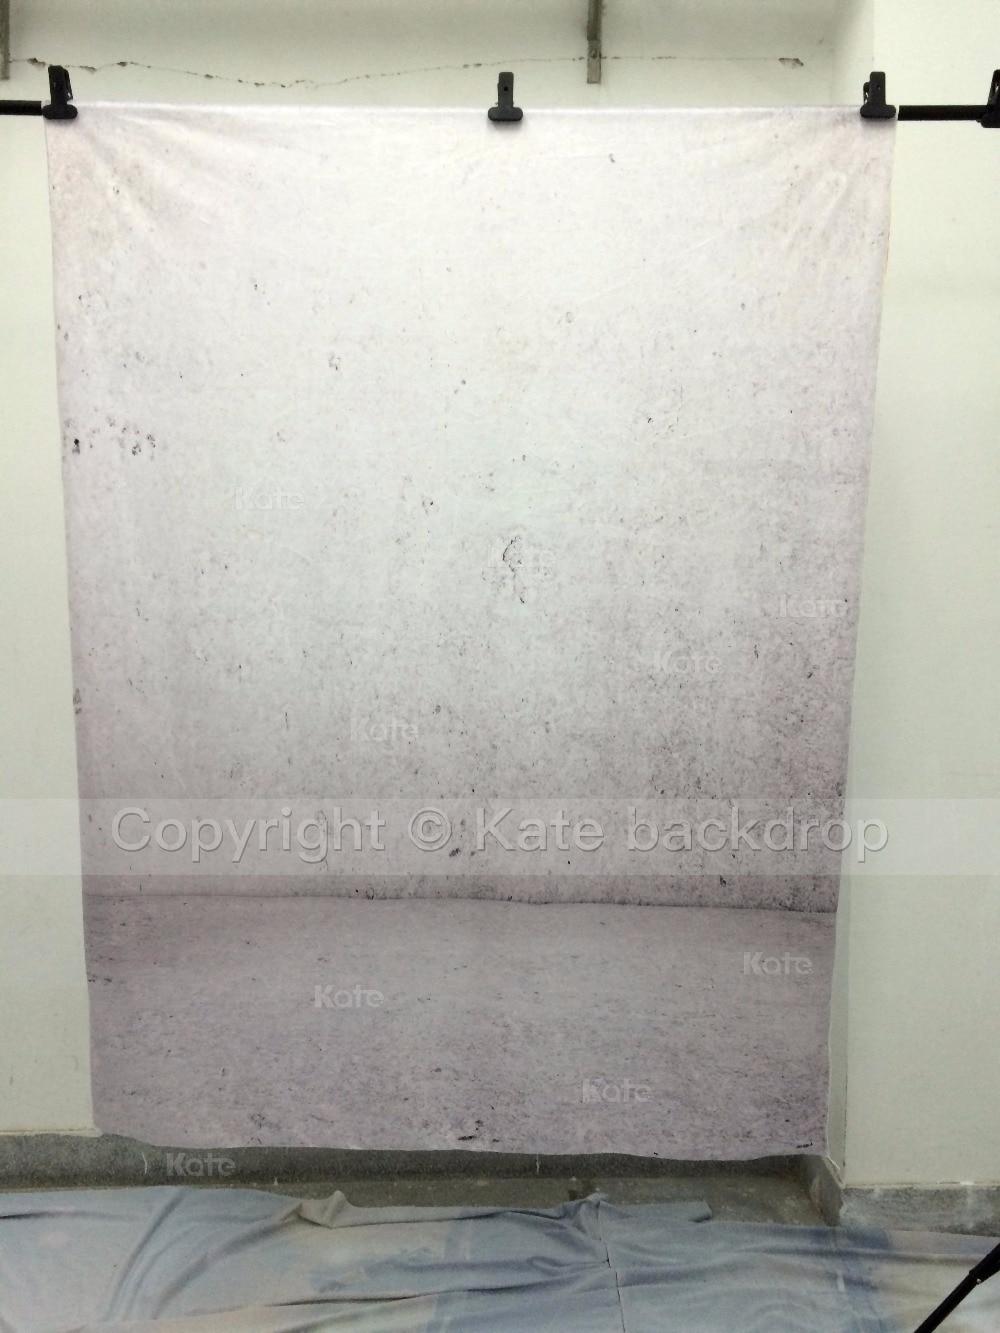 Kate Newborn Baby Background Solid White Floor Fundo Fotografico  -> Fundo Madeira